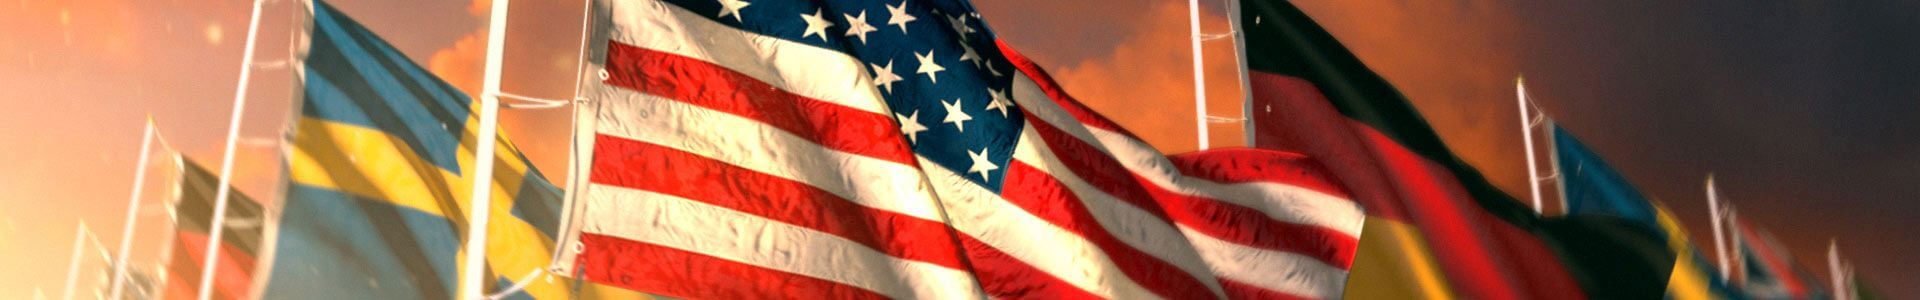 https://i0.wp.com/na-wotp.wgcdn.co/dcont/fb/image/flag_day_0619_1920x300_s.jpg